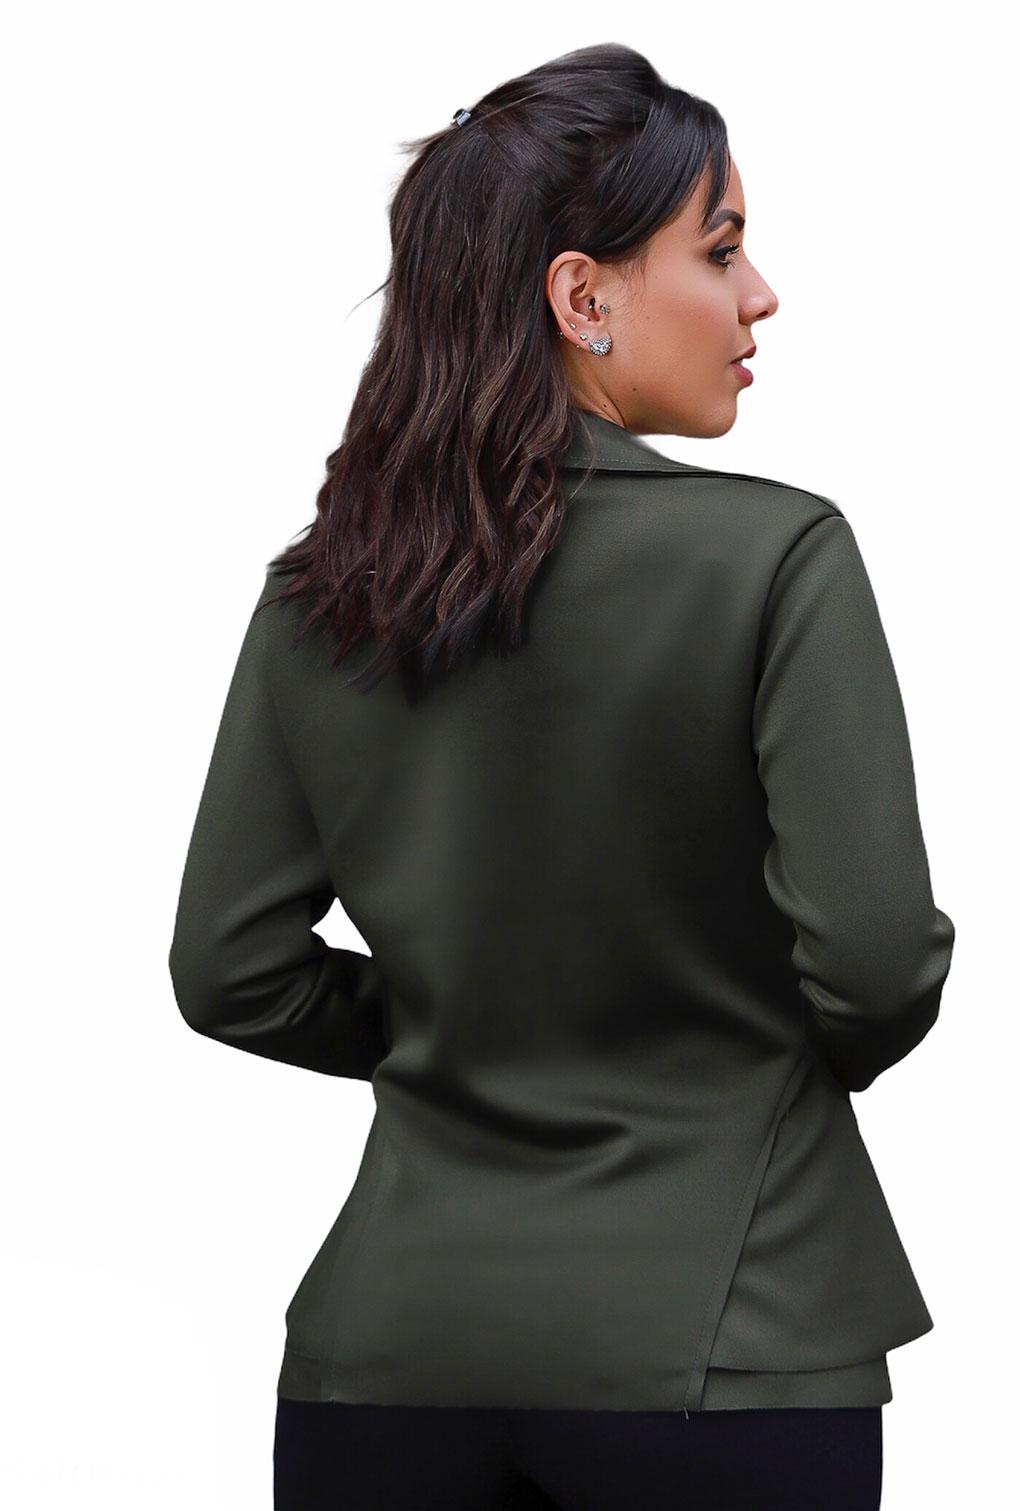 Blazer Casaquinho Neoprene Feminino Terninho Verde Militar  - ModaStore | Moda Feminina